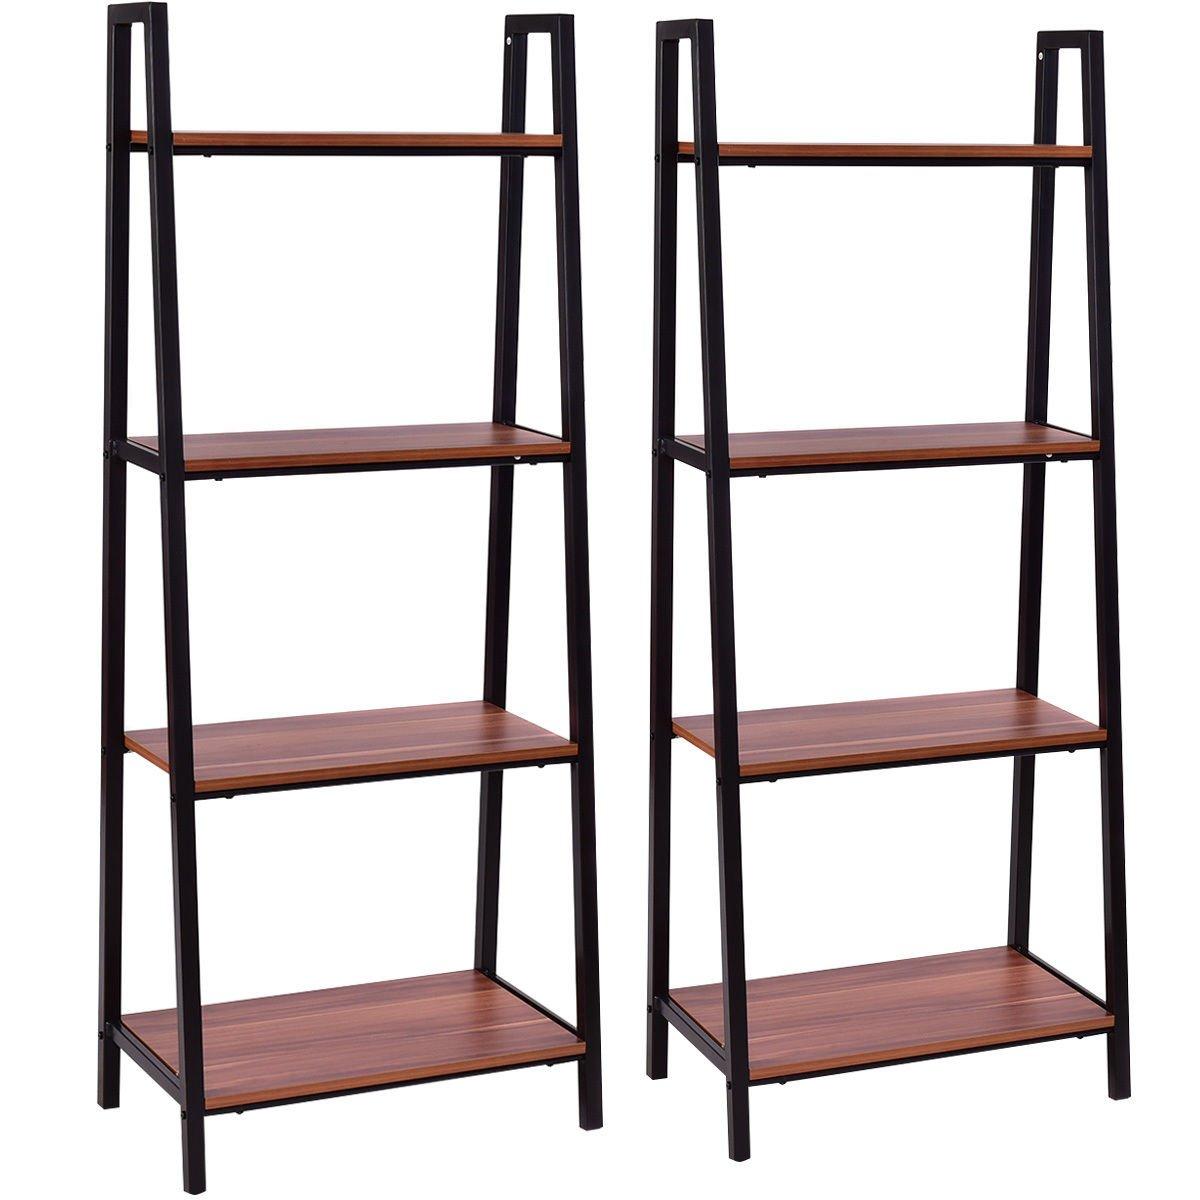 Tangkula 4-Tier Ladder Shelf Ladder Bookcase Indoor Outdoor Wood Bookshelf Display Shelves Plant Flower Stand Shelf (2)